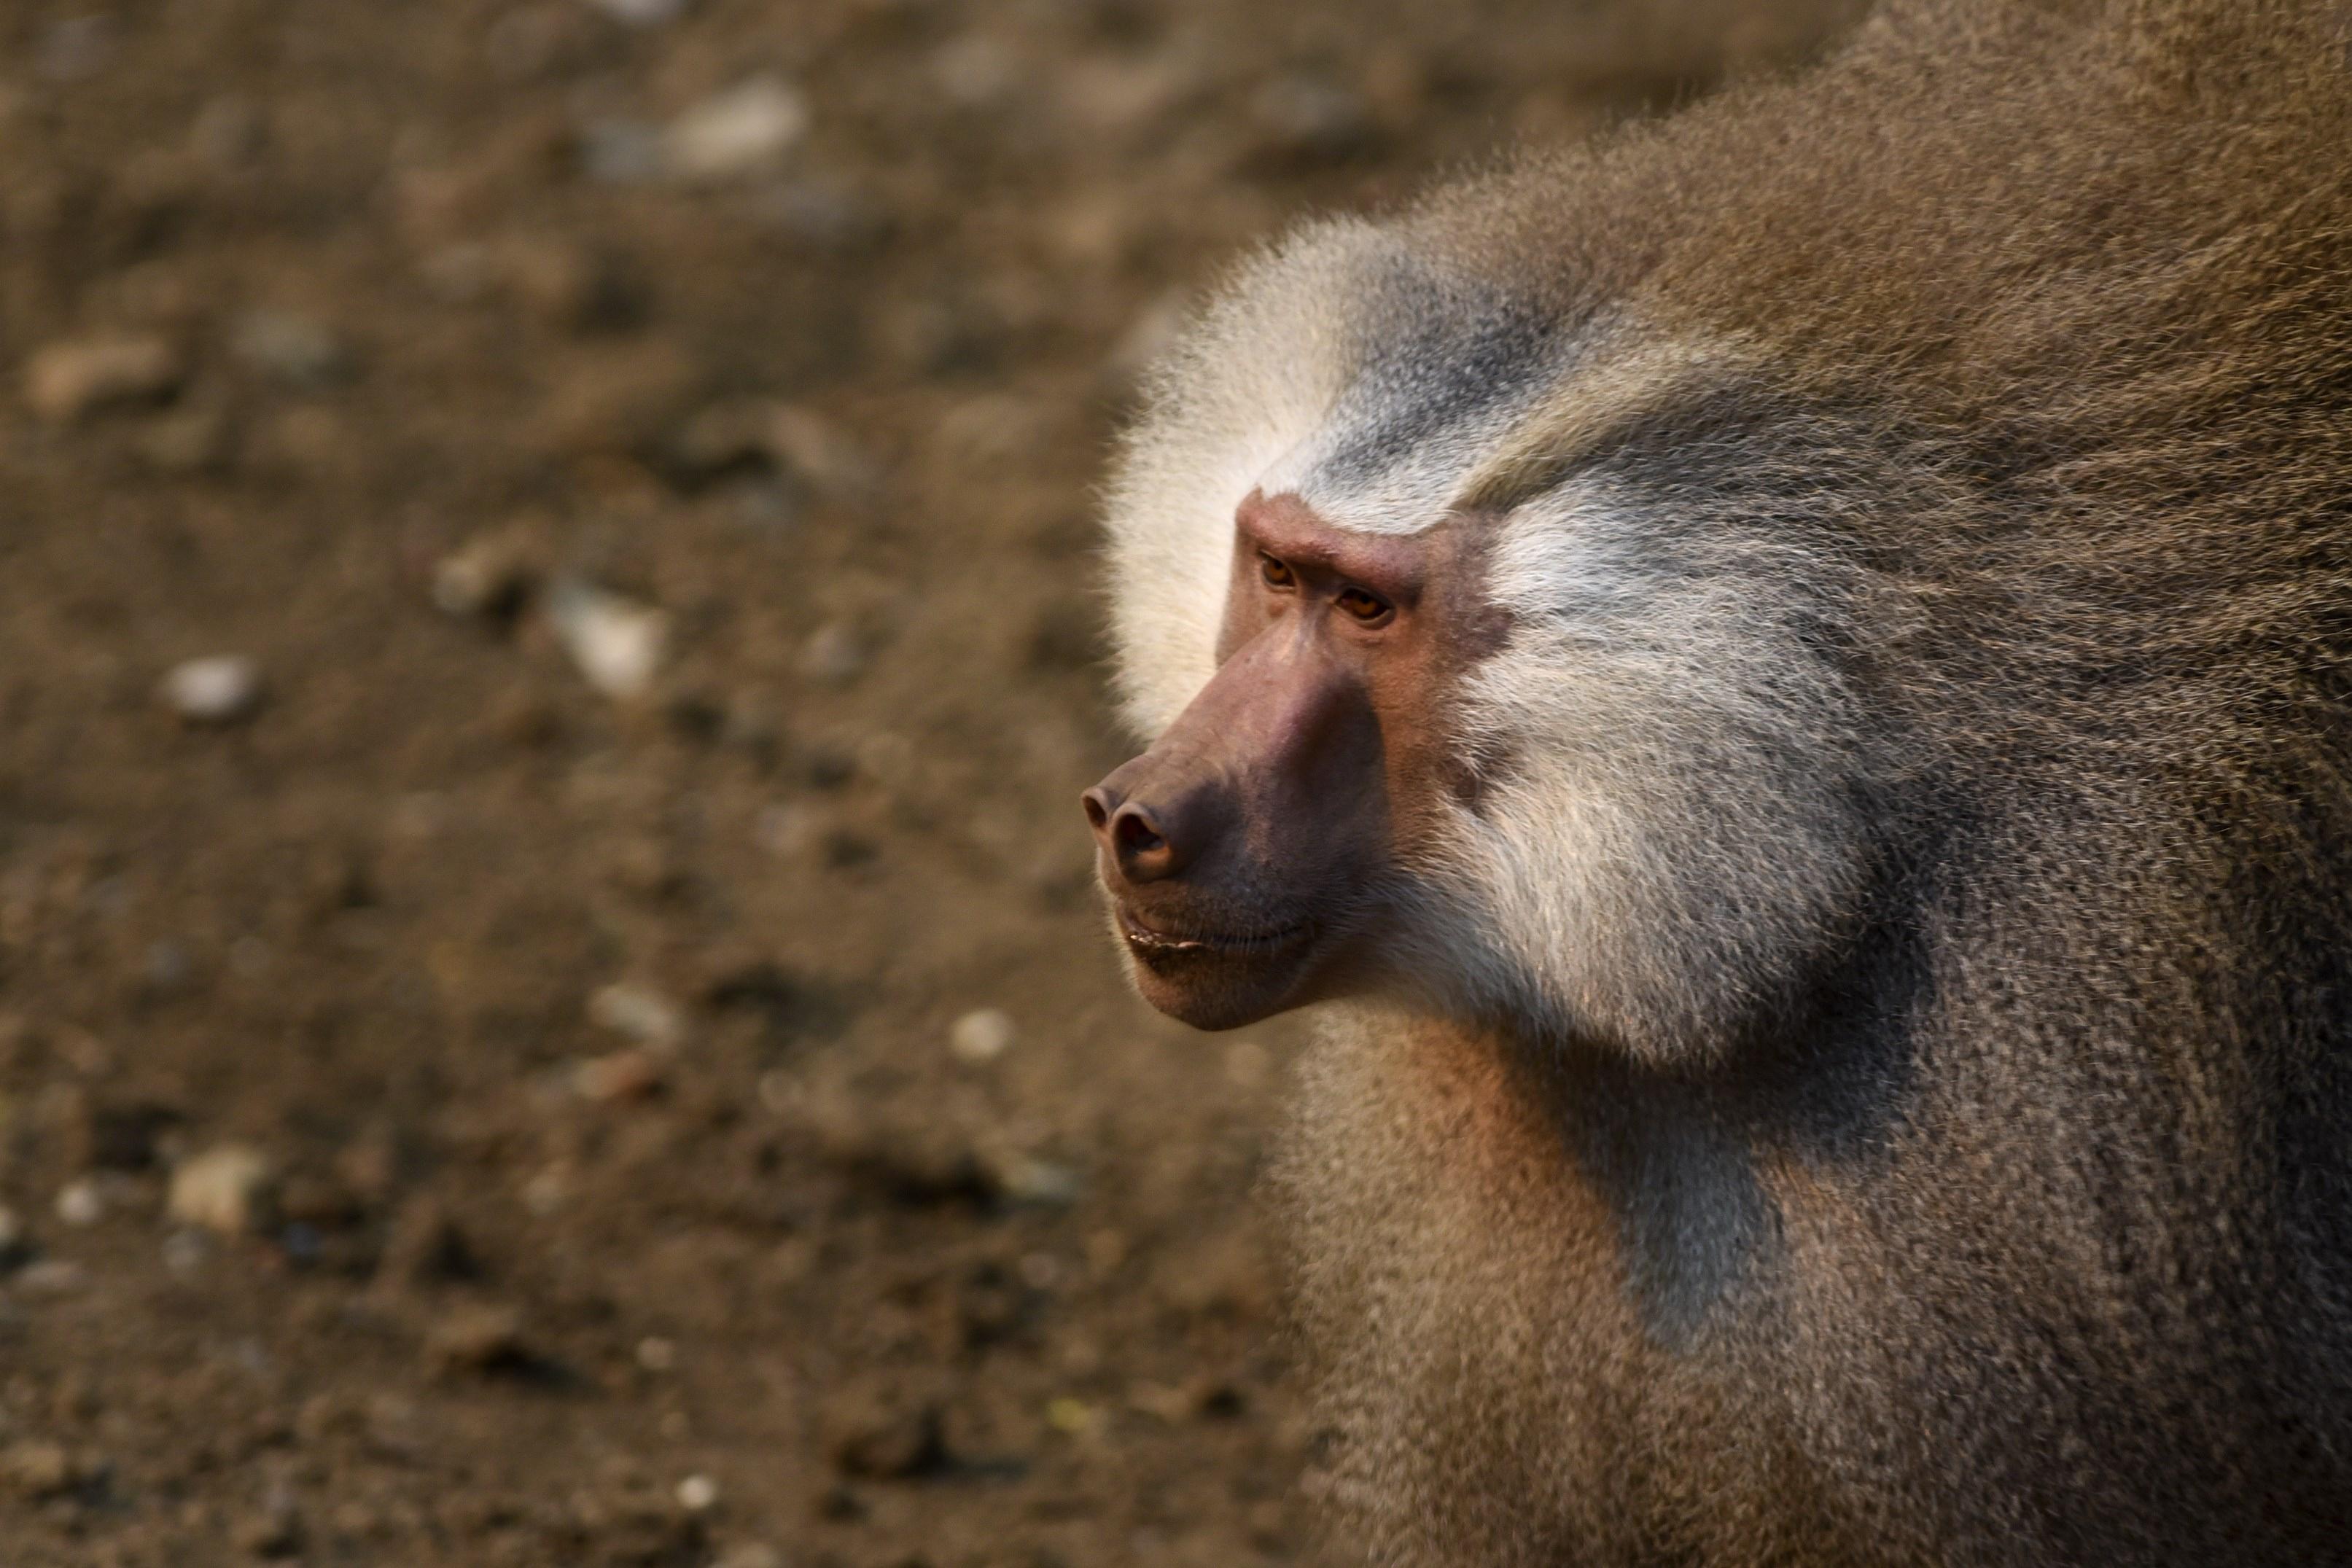 A baboon monkey (Papio hamadryas).